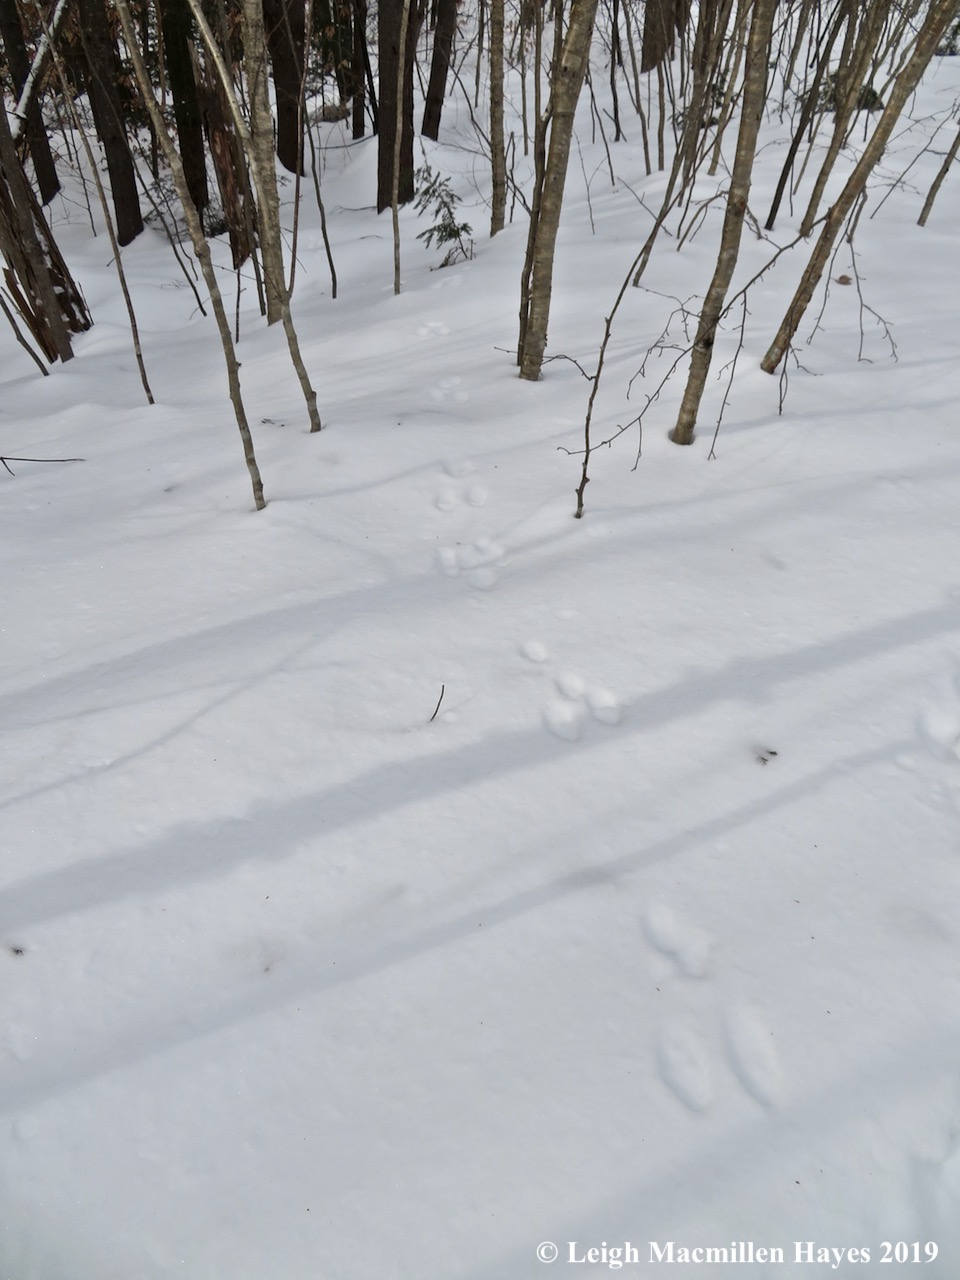 20-snowshoe-hare.jpg